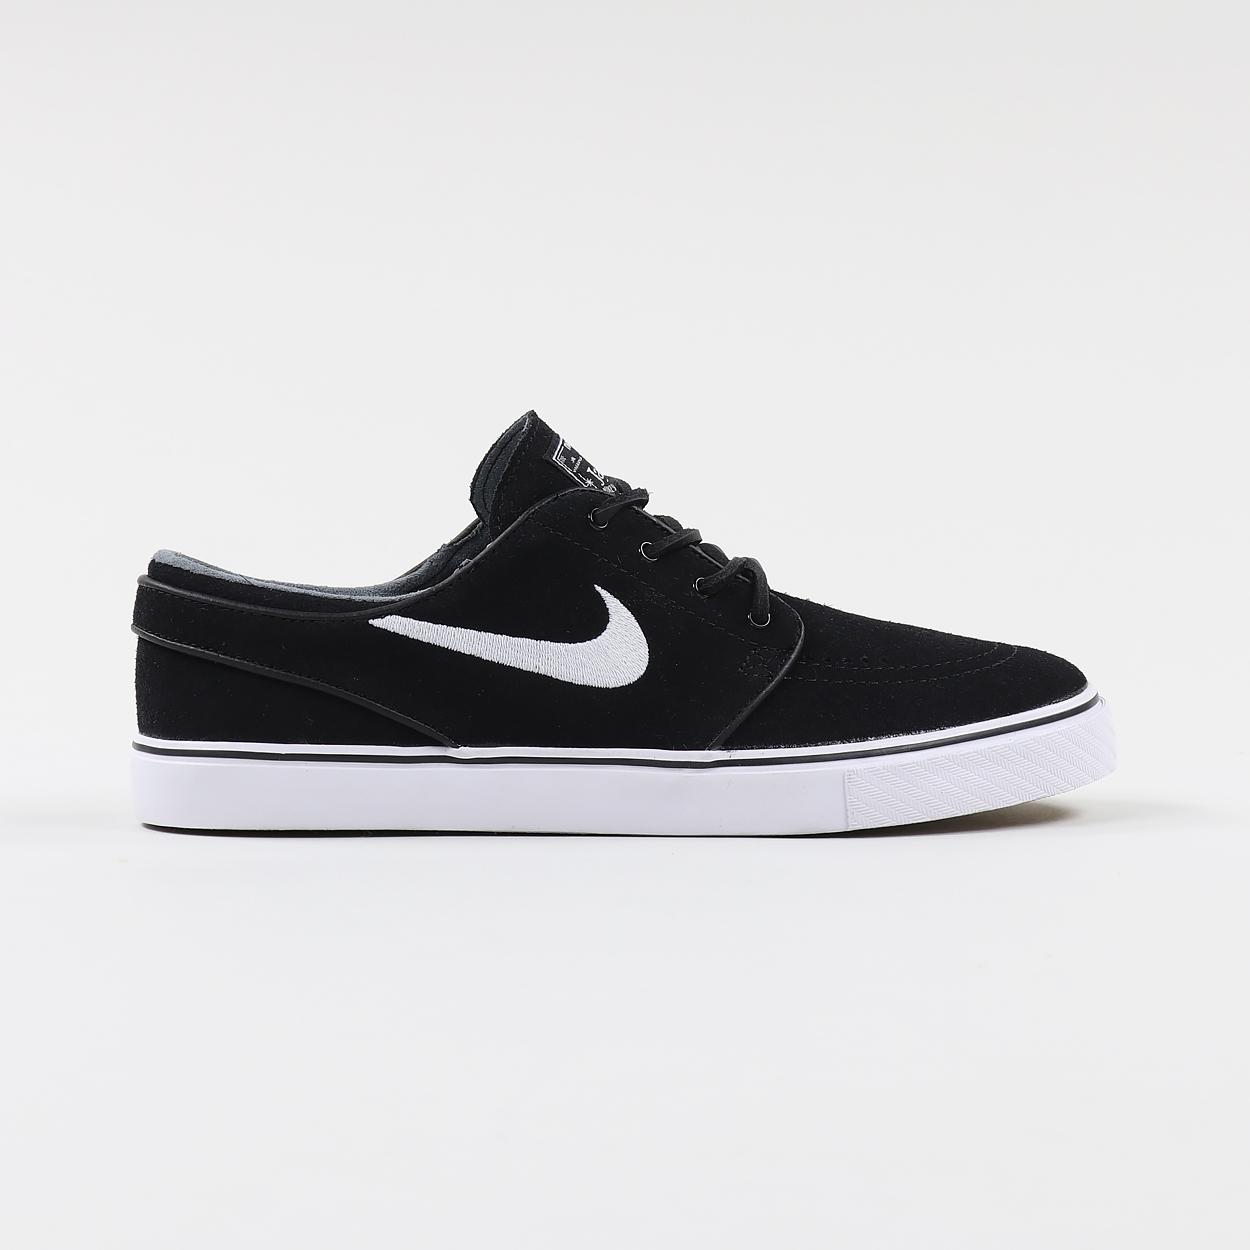 buy popular a5f4f acb1d Nike SB Zoom Stefan Janoski OG Shoes Black White